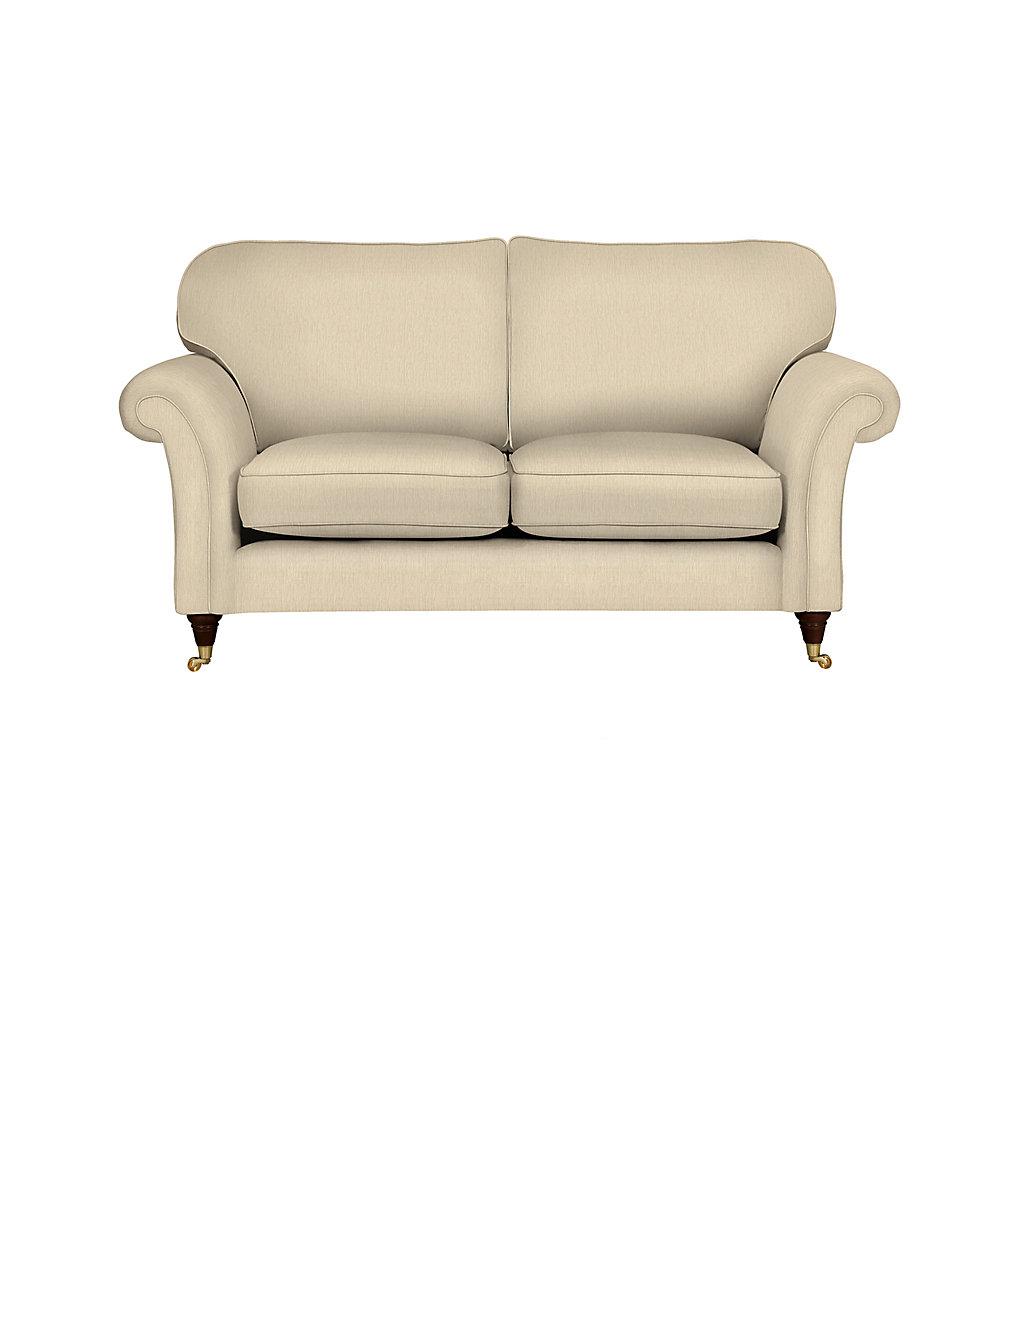 M S 2 Seater Sofa Sofa Review